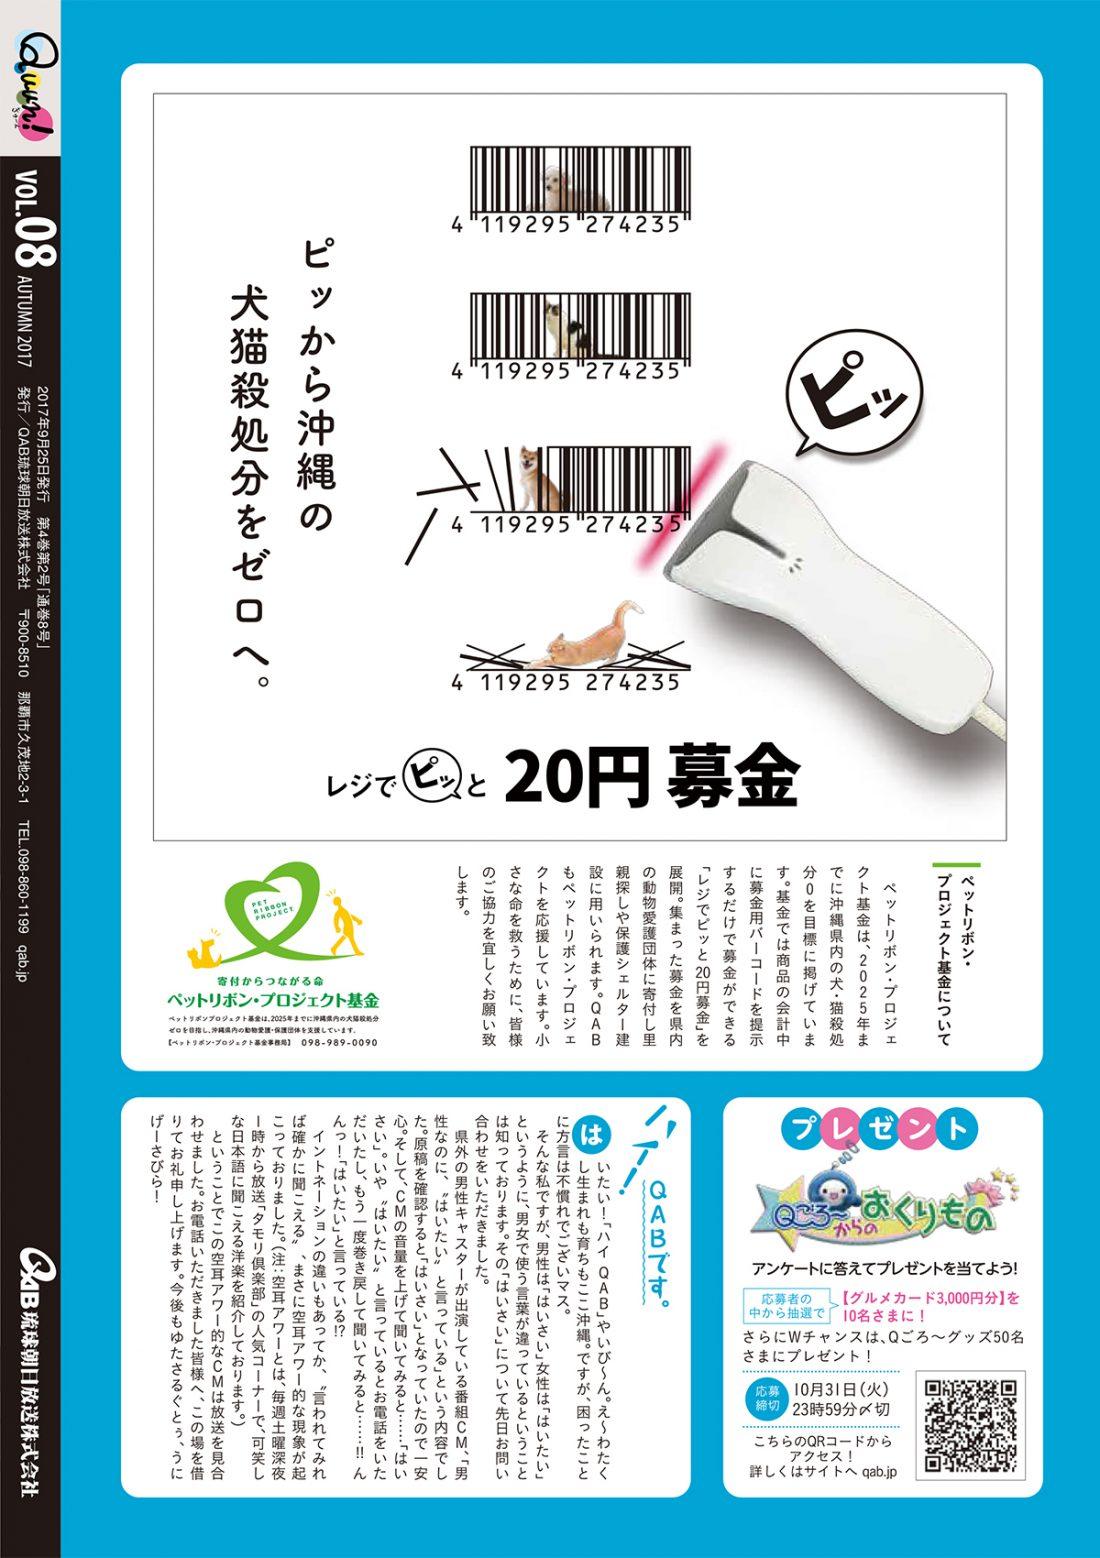 http://www.qab.co.jp/qgoro/wp-content/uploads/quun_0816-1100x1558.jpg